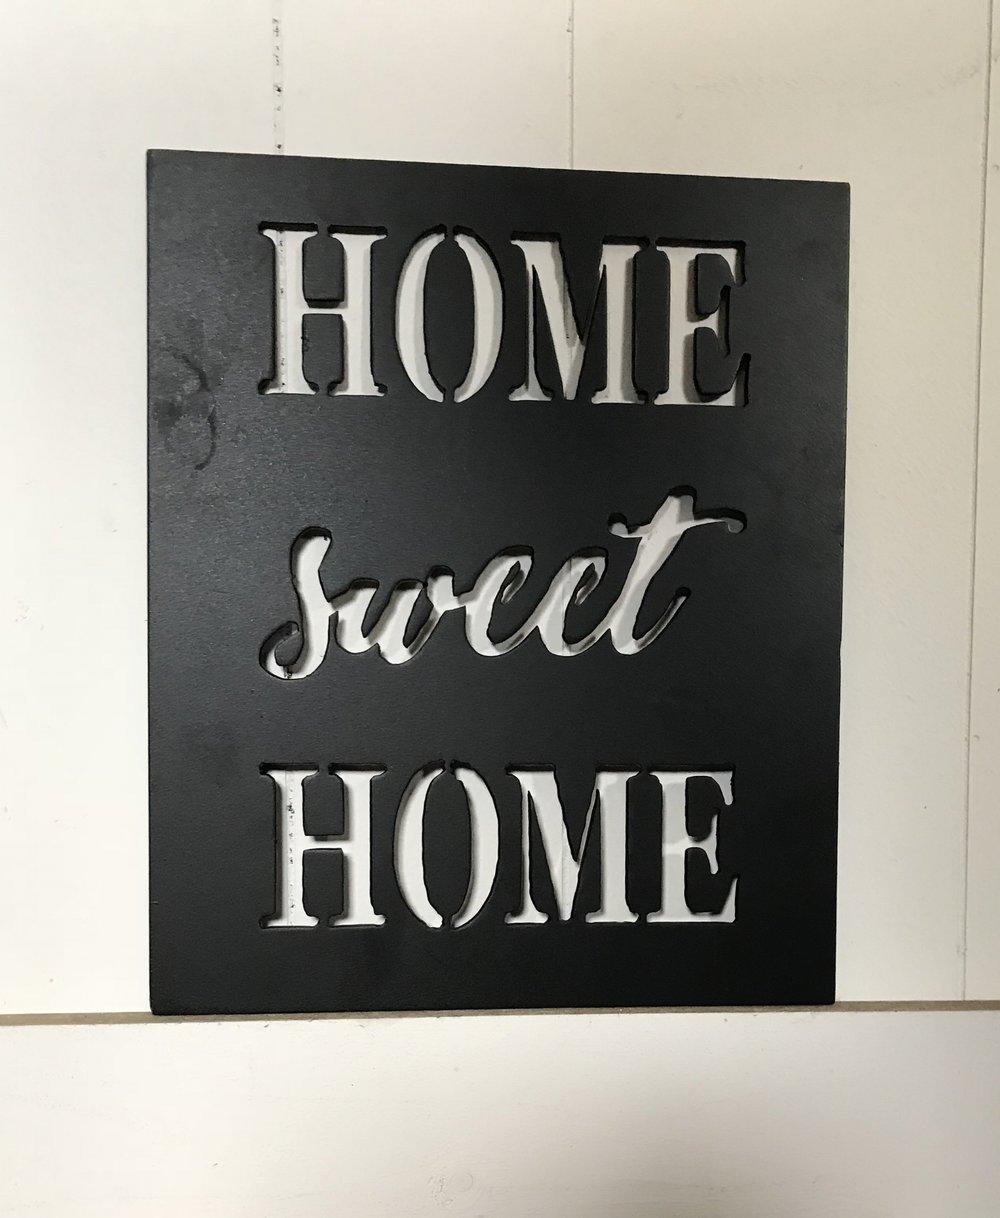 Sandhills Welding: Custom Plasma Art and Yard Signs, Powder Coating ...